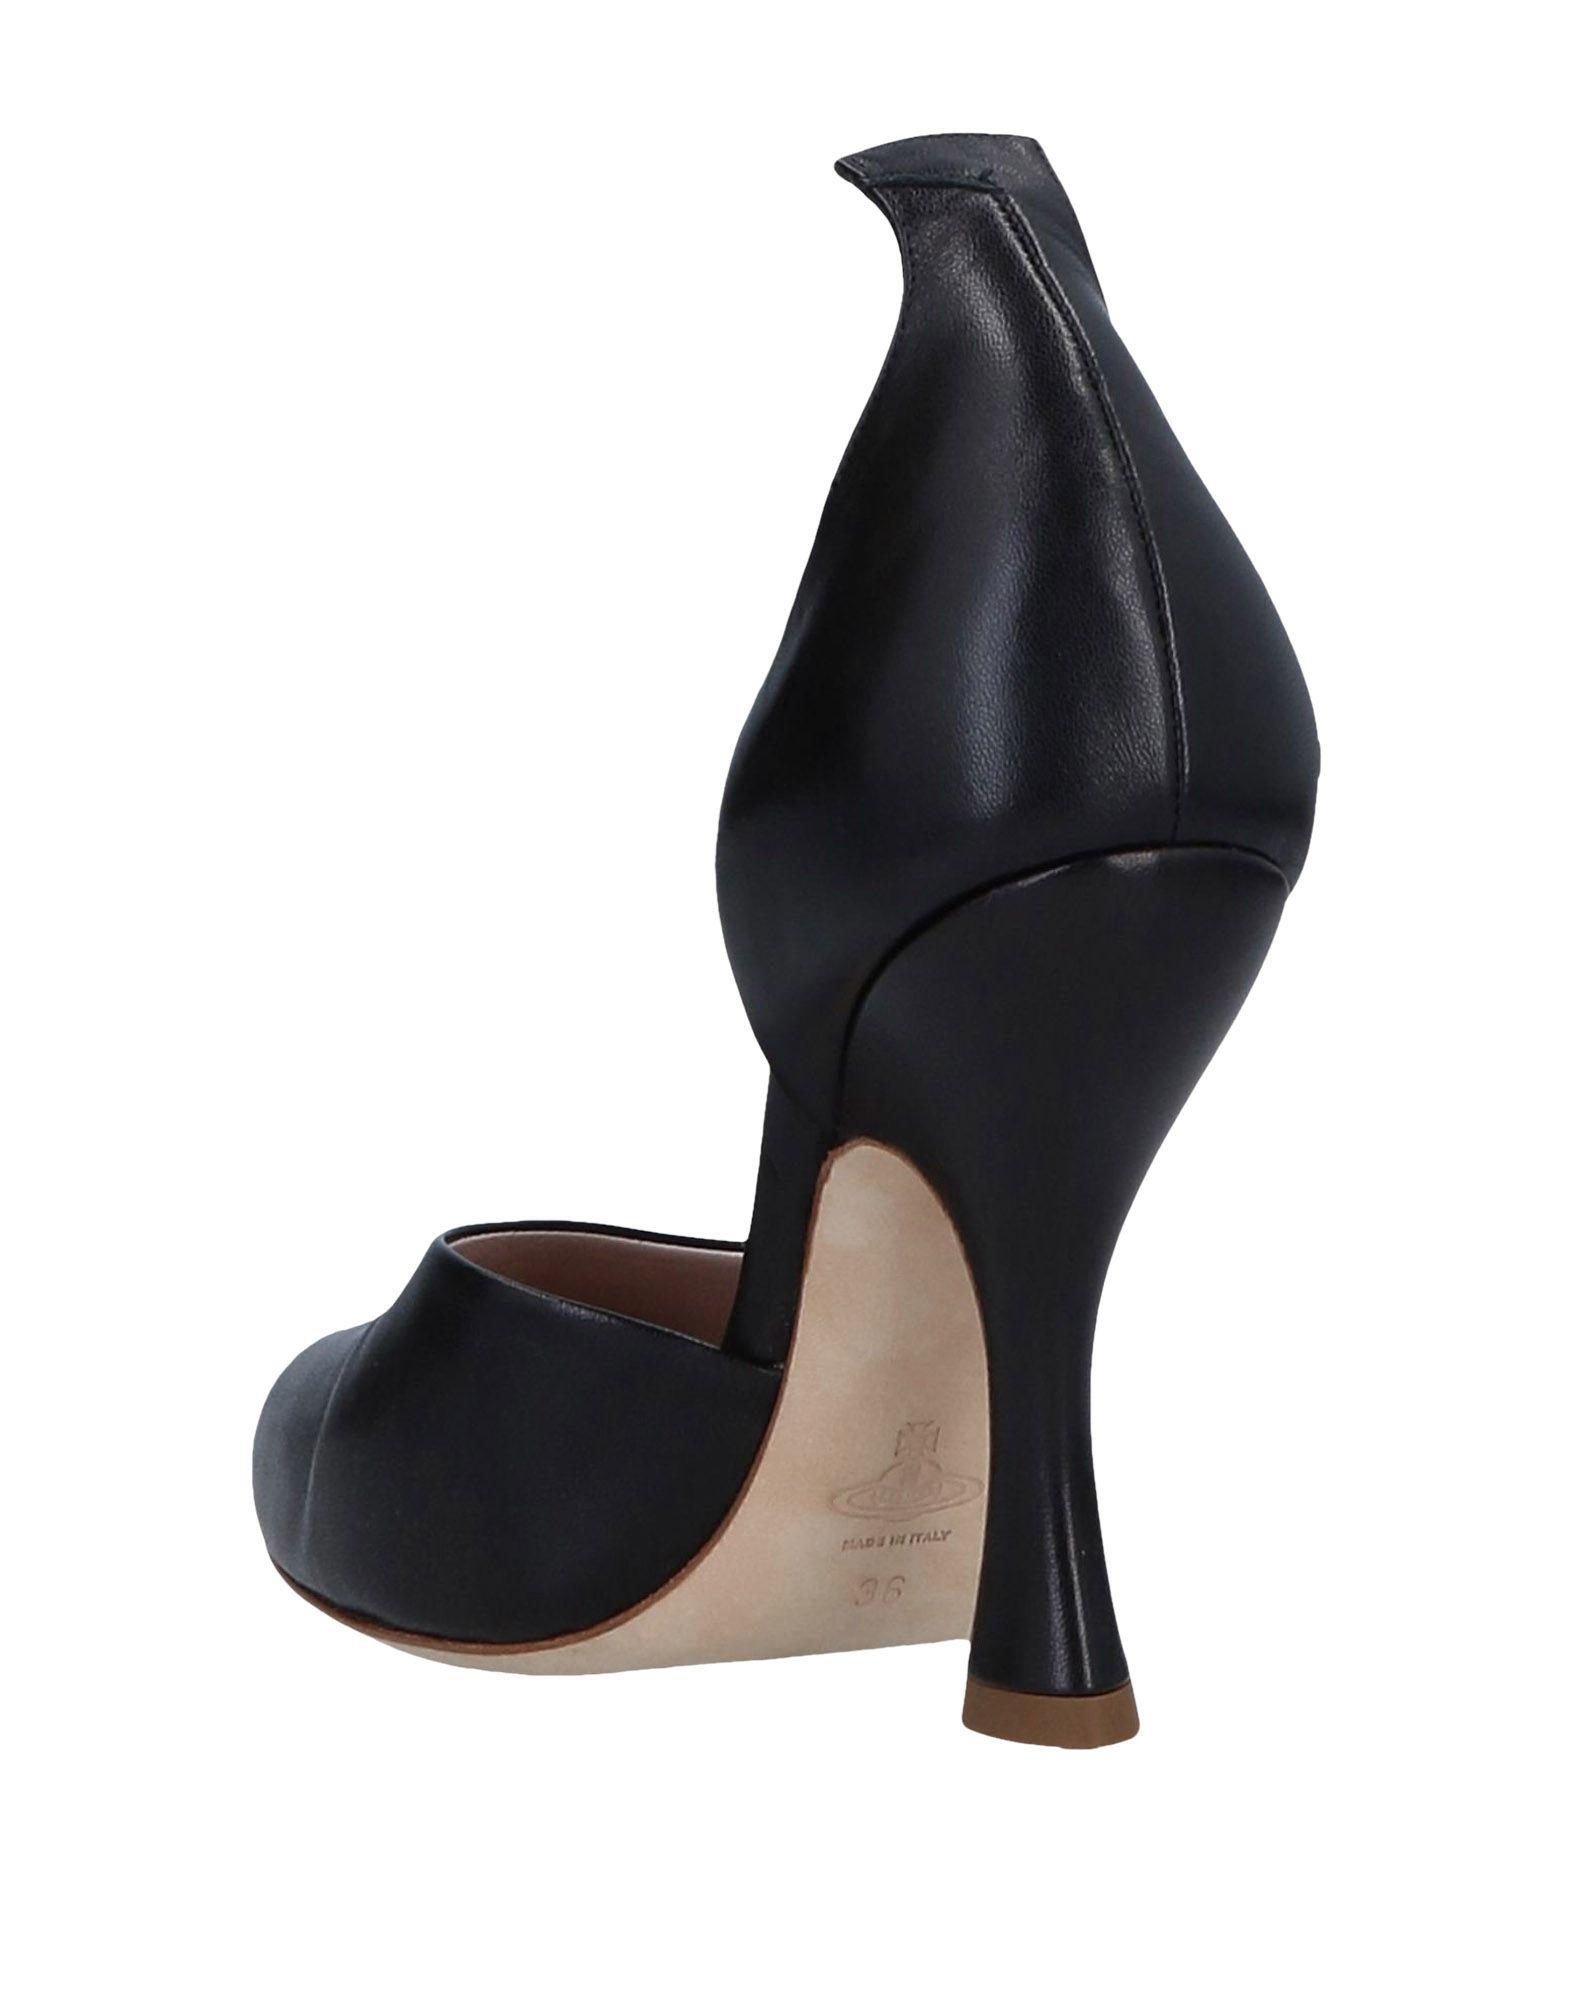 Rabatt Schuhe Pumps Vivienne Westwood Pumps Schuhe Damen  11521014QL 098560